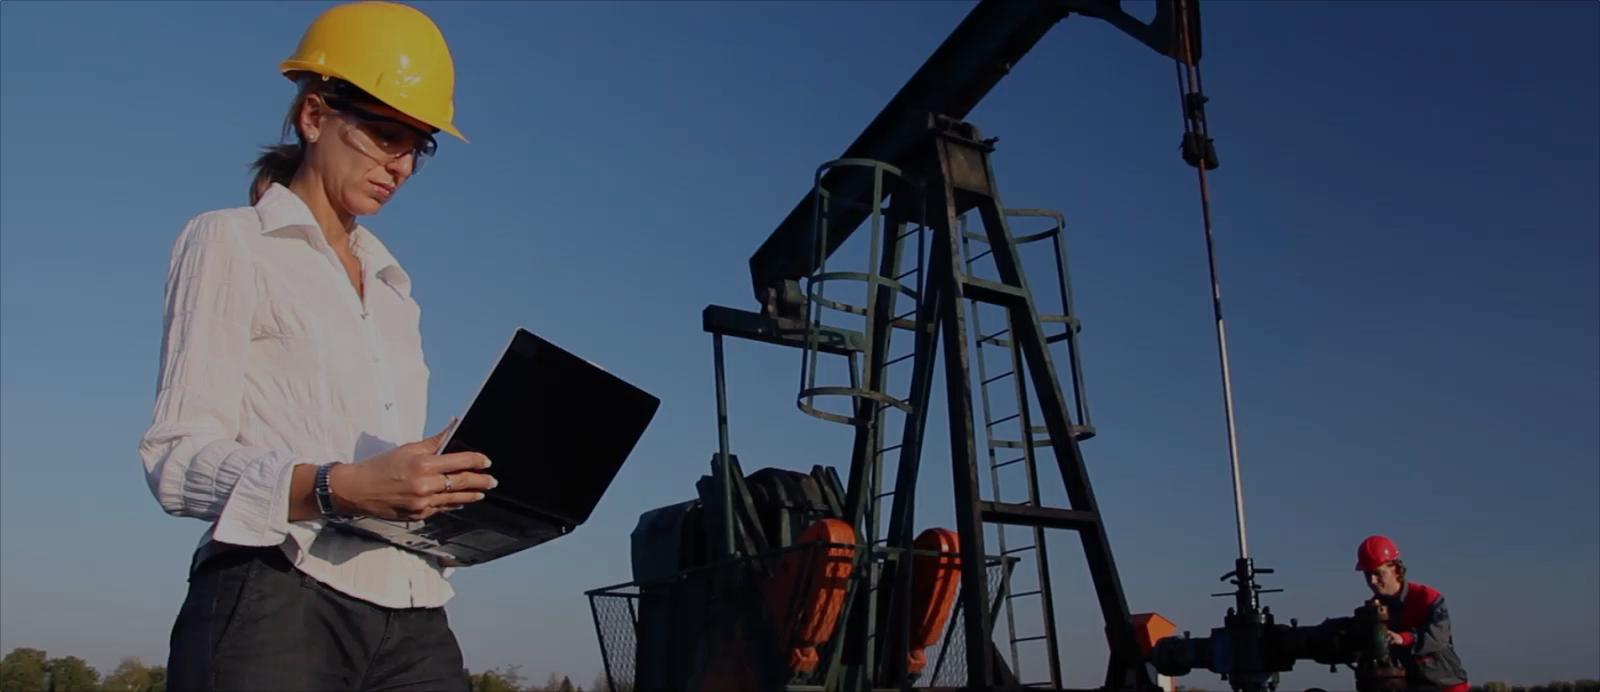 Energie und Bergbau